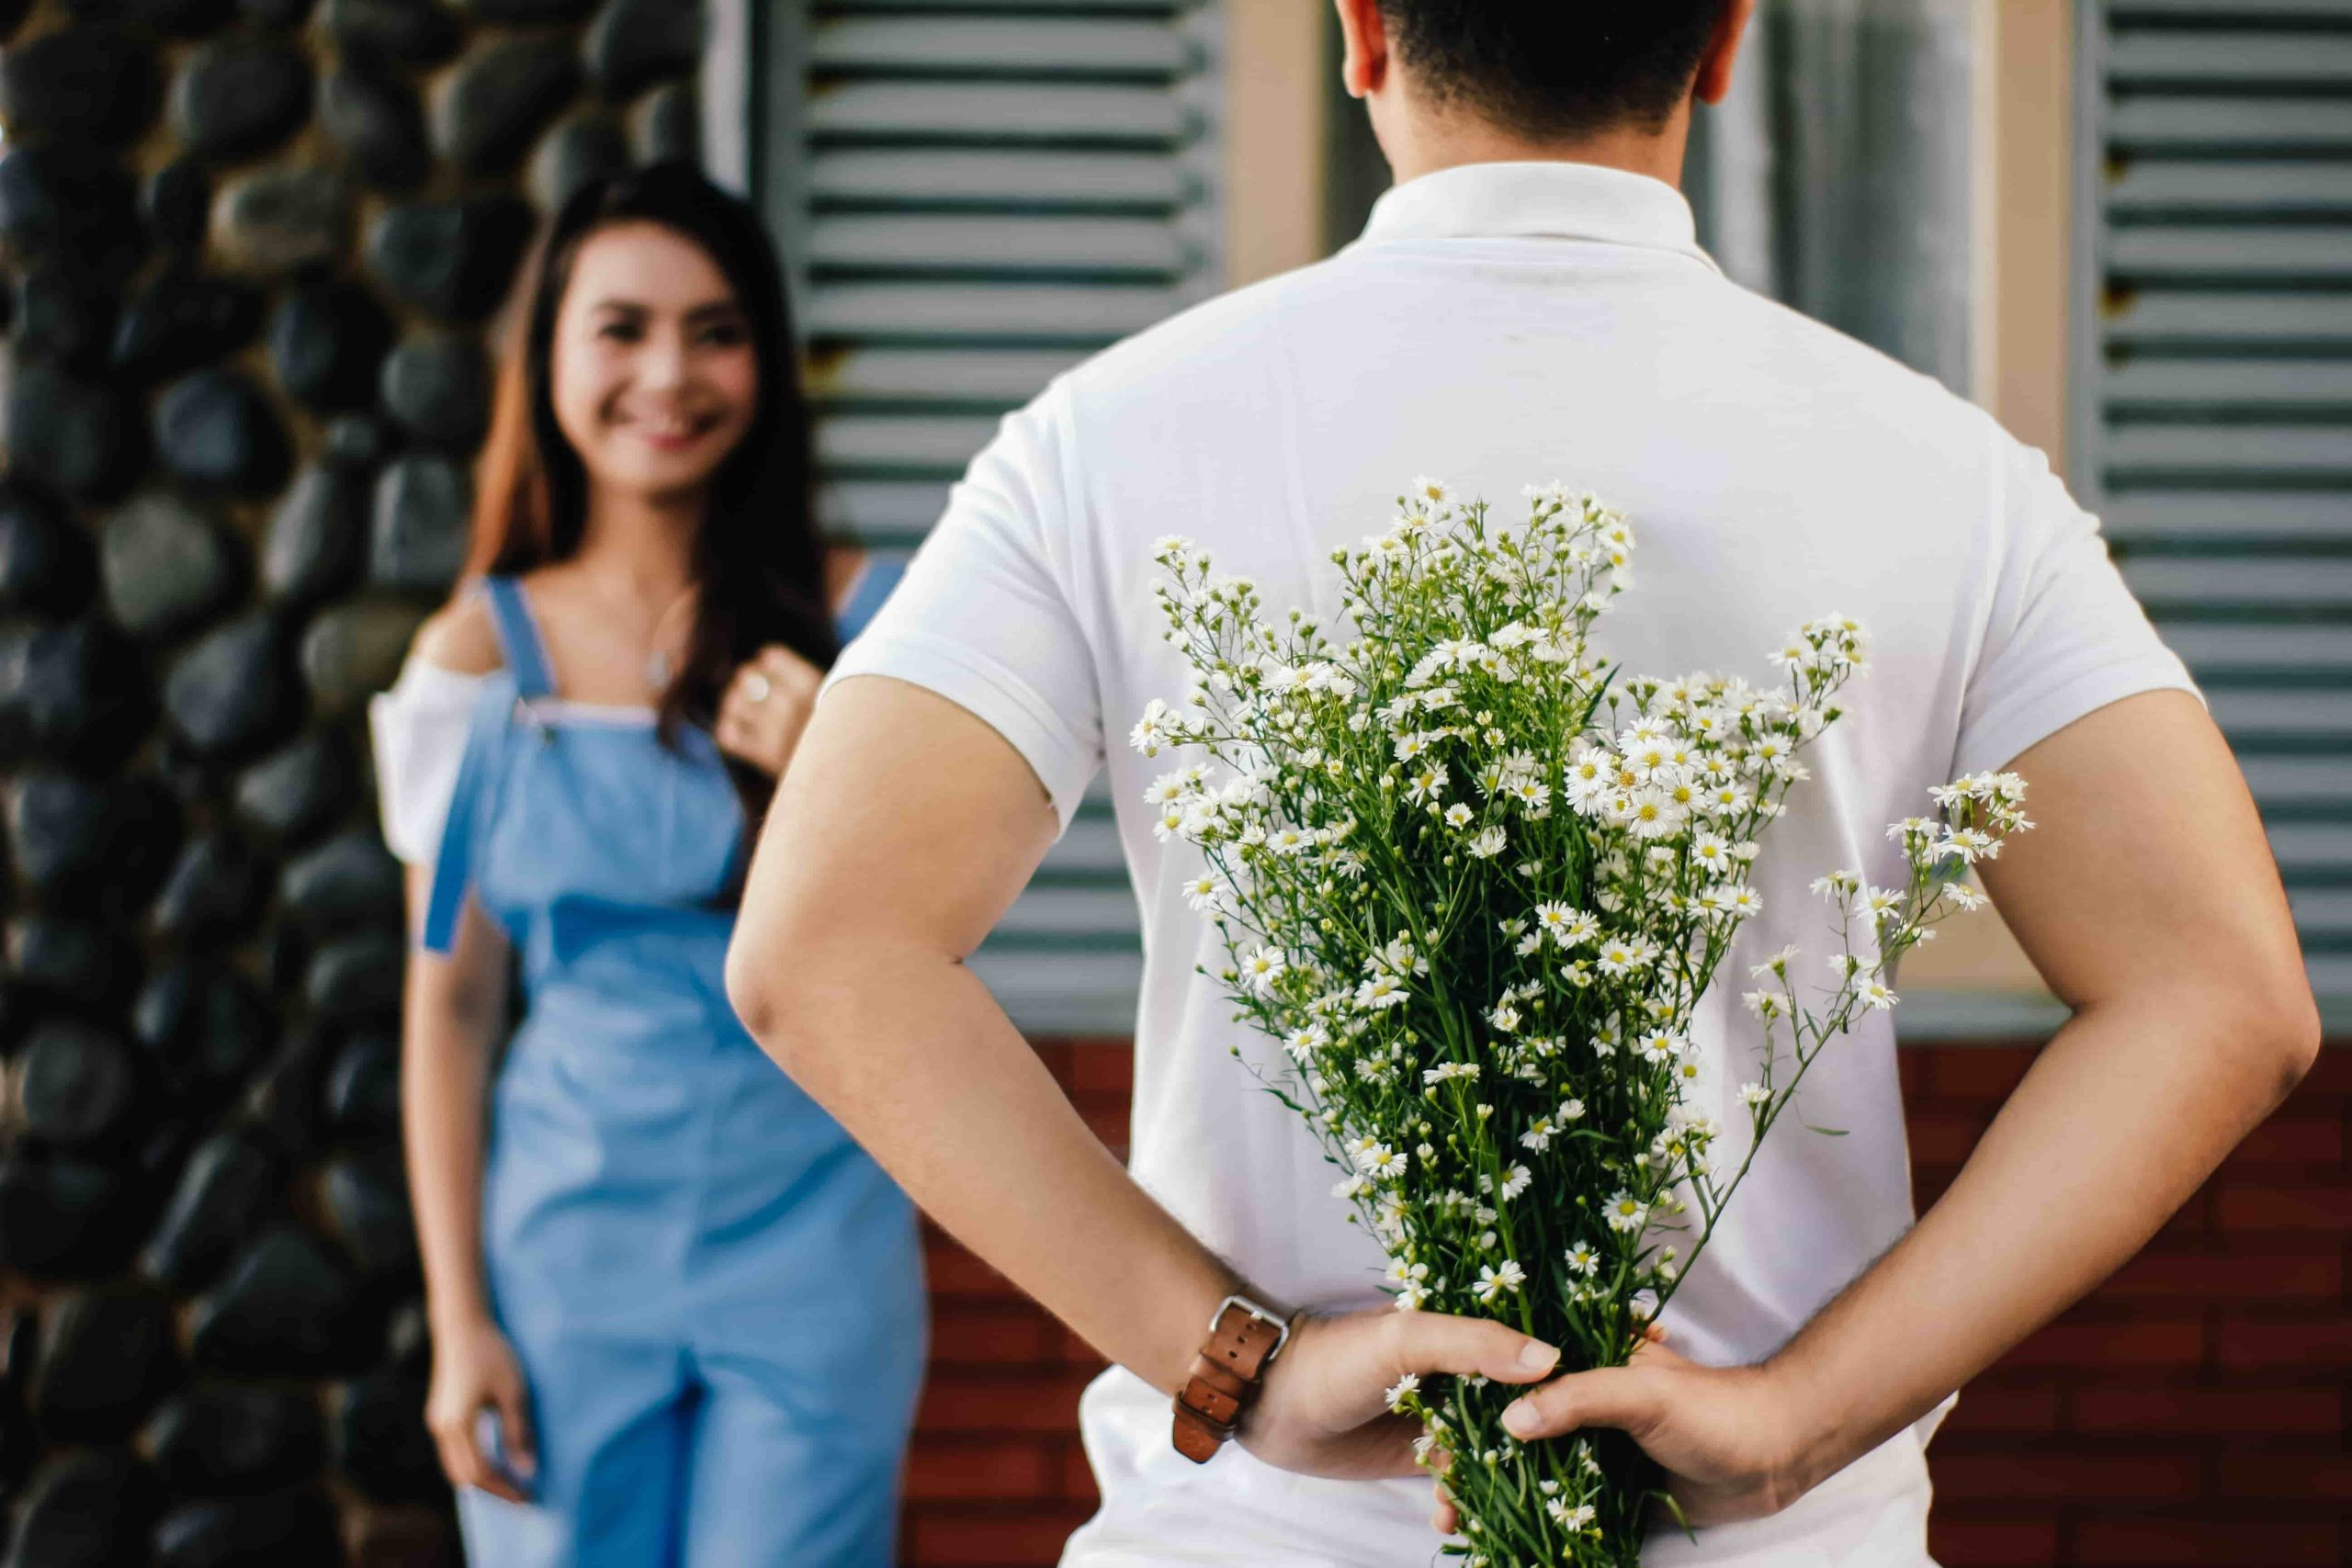 Fira bröllopsdagen